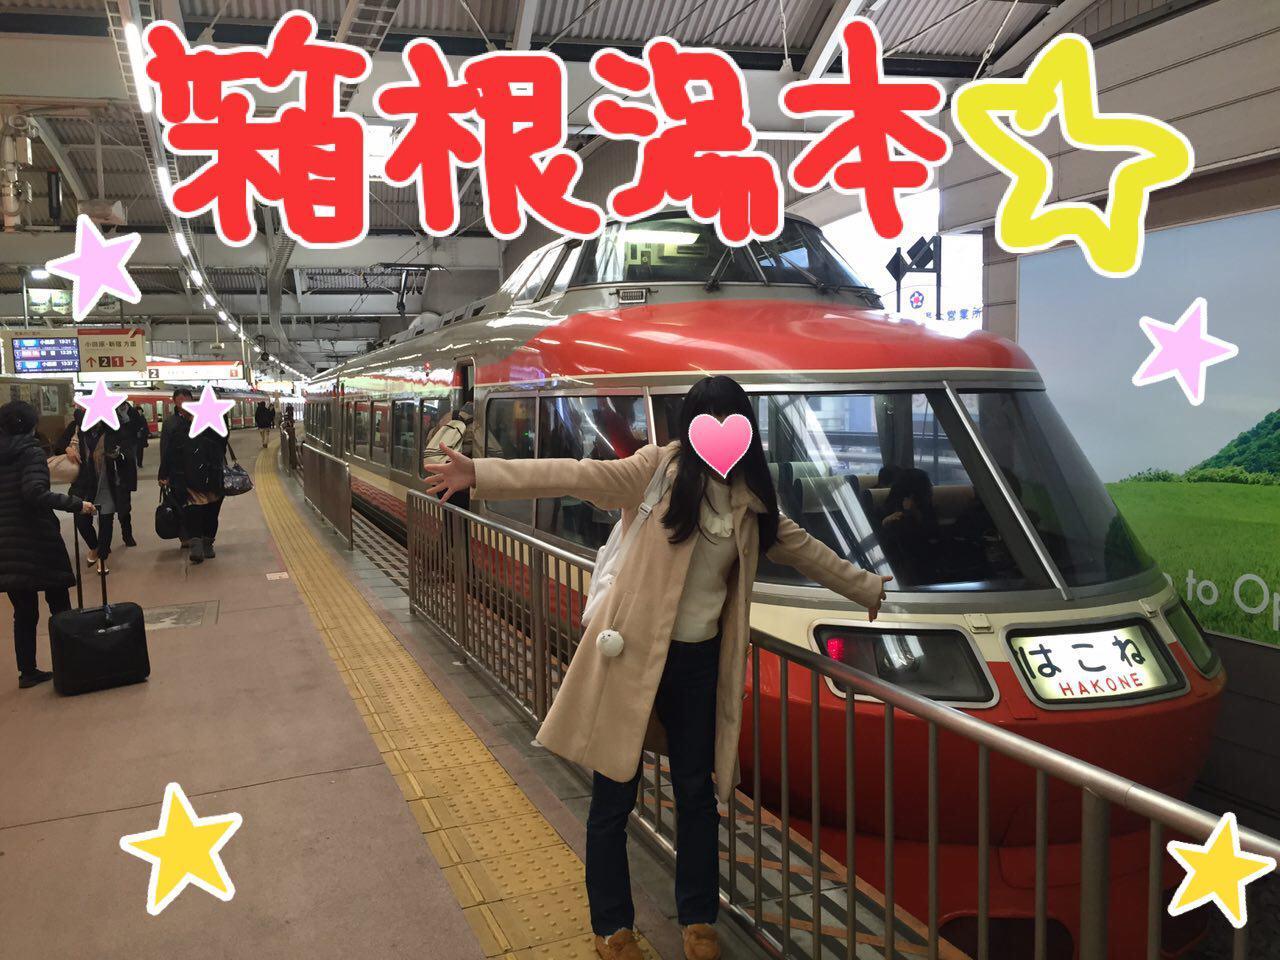 photo_2017-02-24_21-31-16.jpg